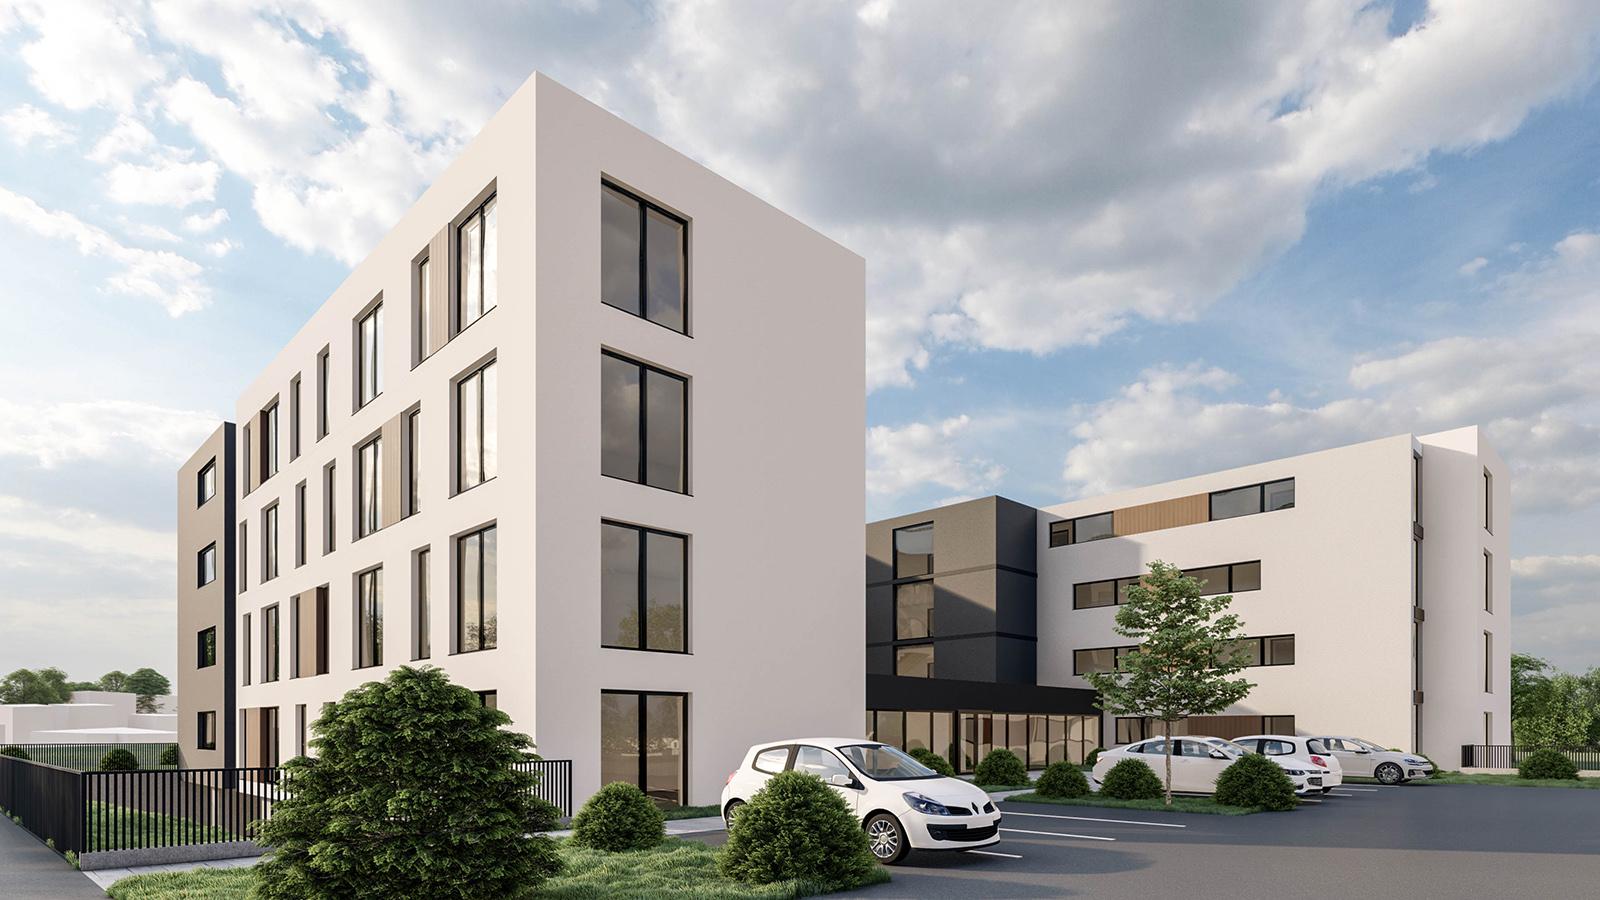 IMB_Projektentwicklung_Grundstuck_Libenau_HOtel_02